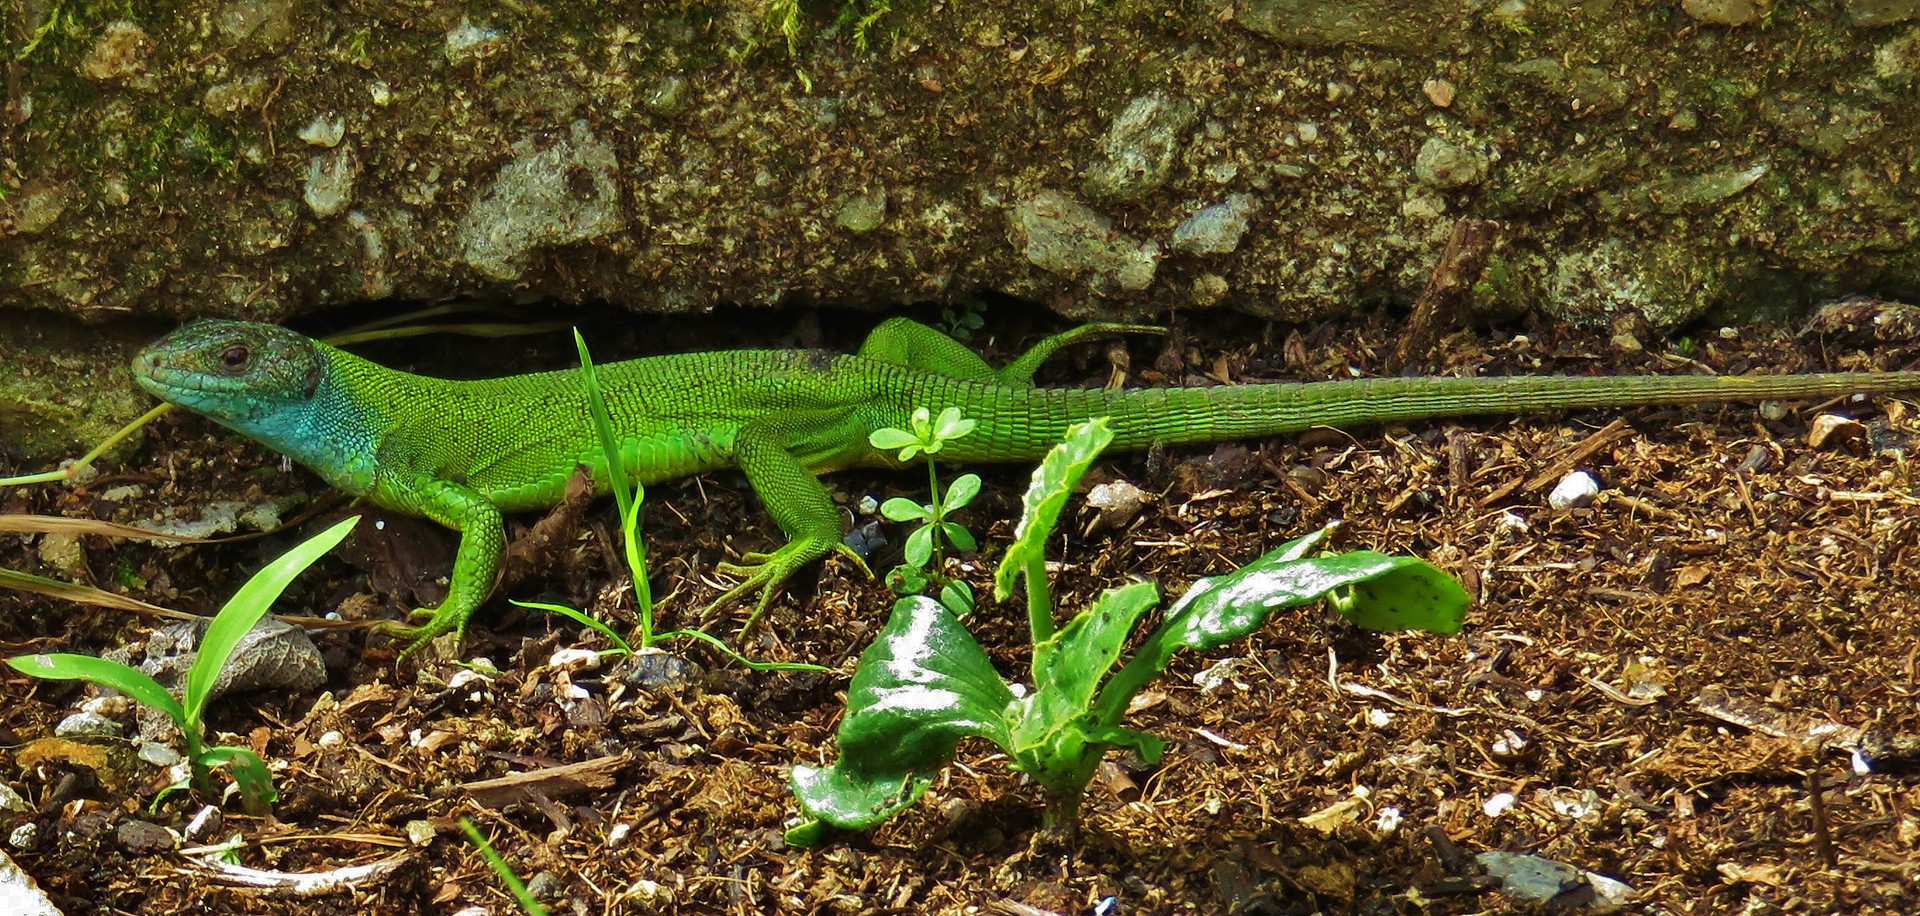 Western green lizard (lacerta bilineata), adult female, Monteggio, Malcantone, Ticino, June 2016.jpg